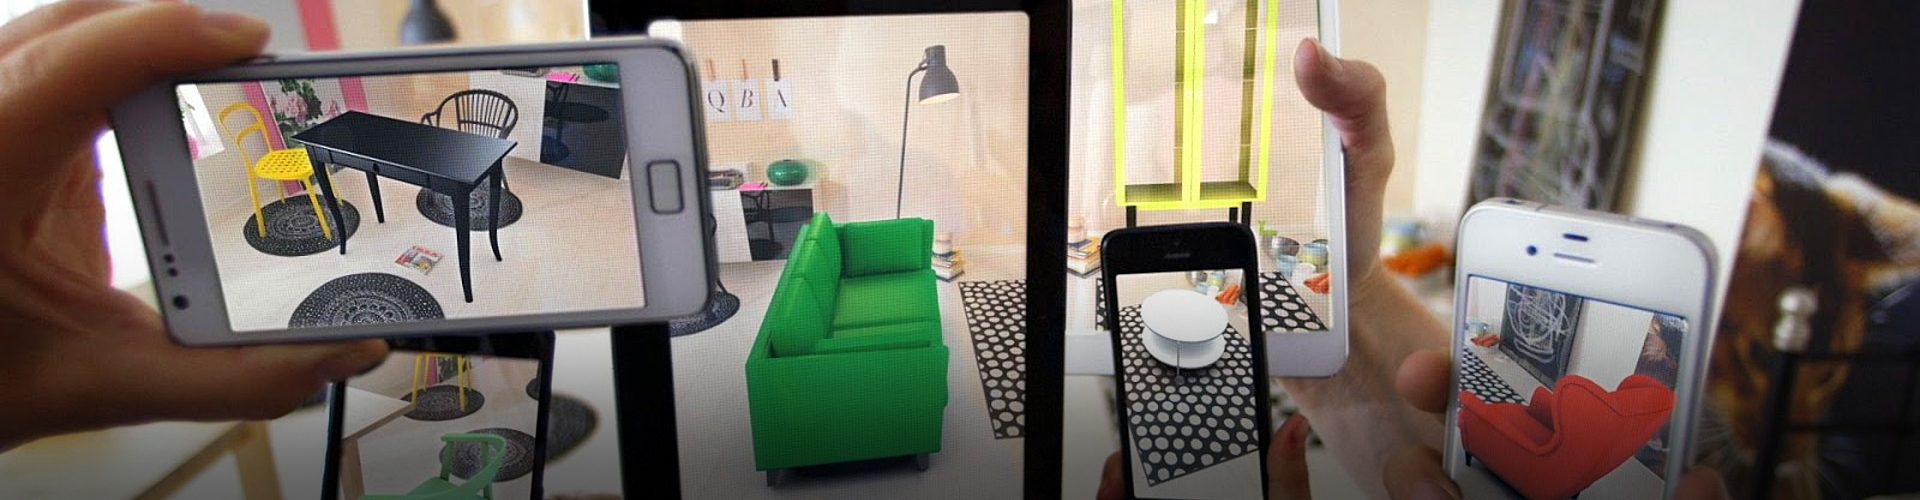 augmented reality digital marketing